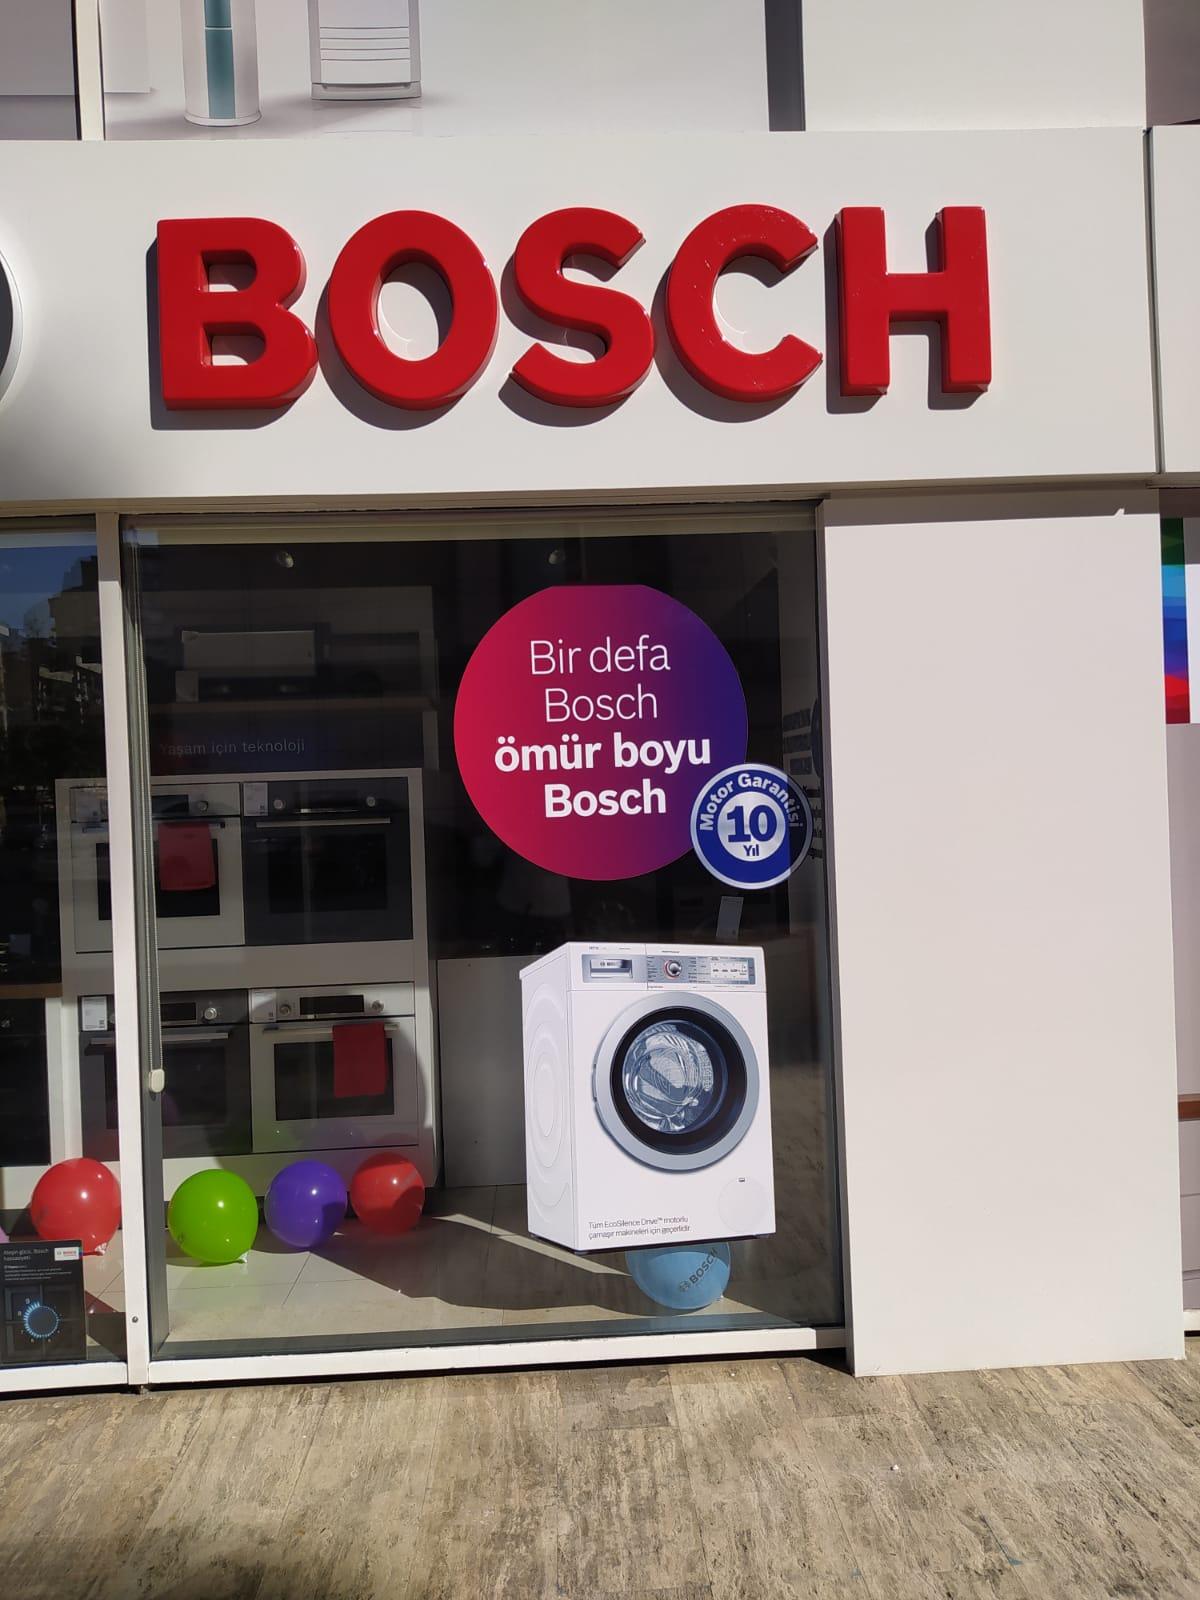 Bosch bas kes etiket